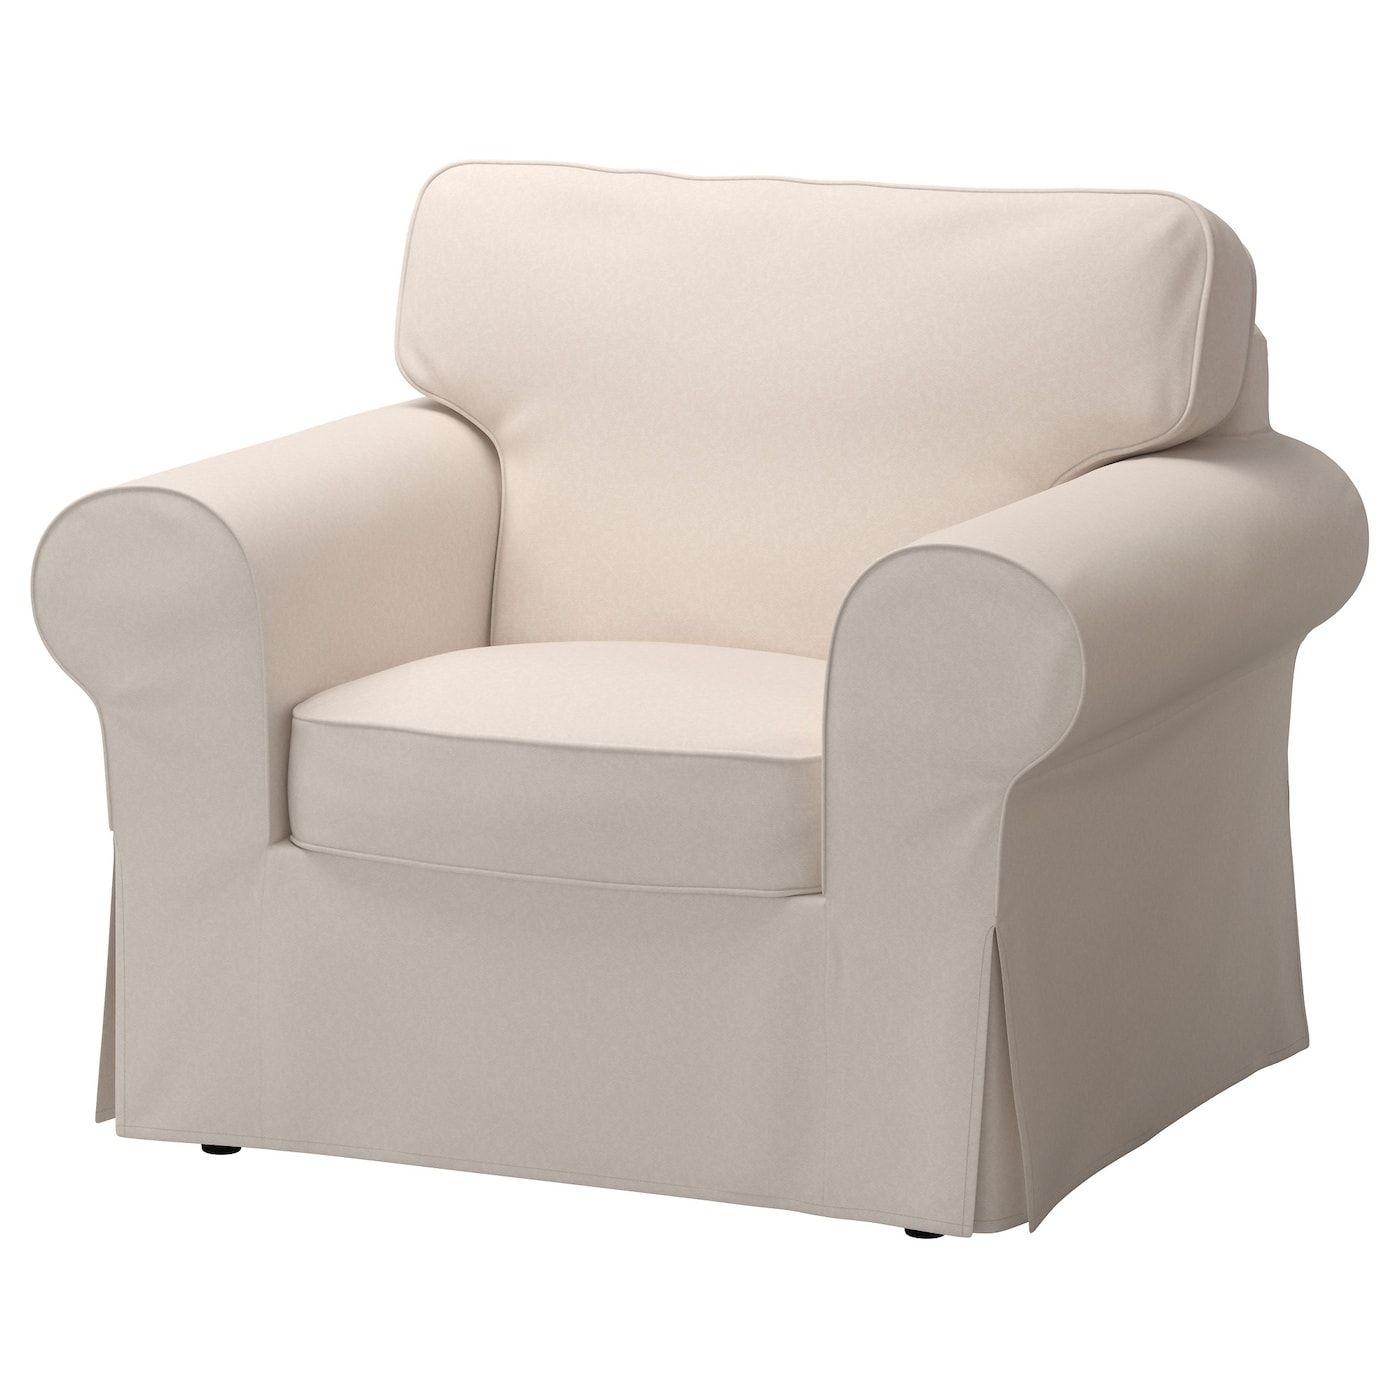 IKEA EKTORP Armchair  Ikea chair cover, Ikea armchair, Slipcovers